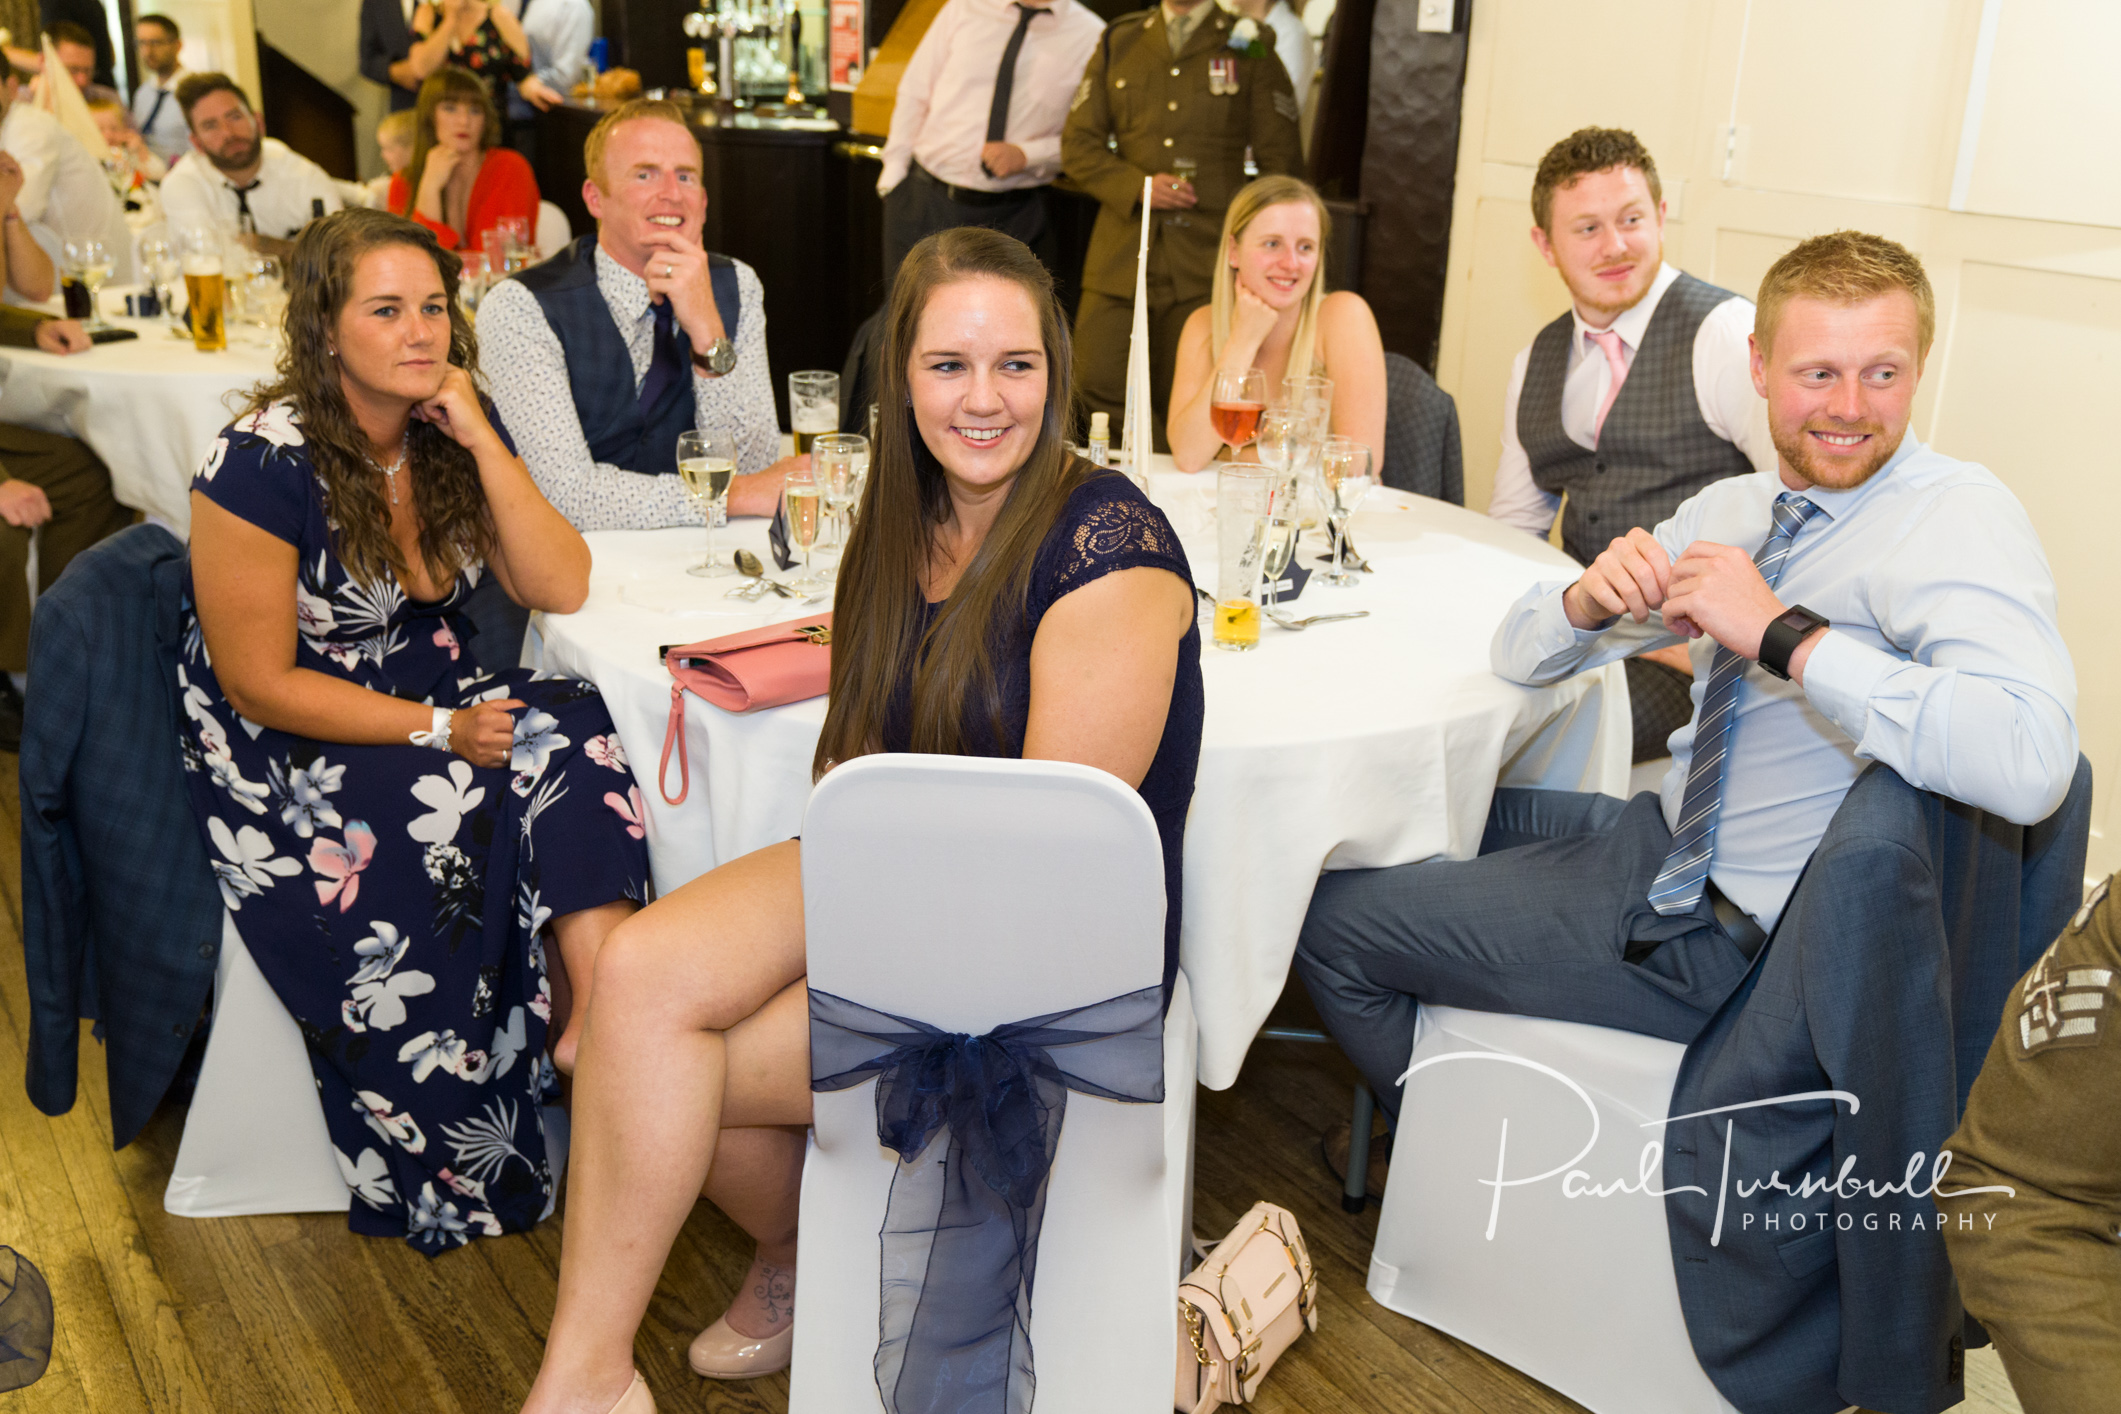 wedding-photographer-south-dalton-walkington-yorkshire-emma-james-059.jpg